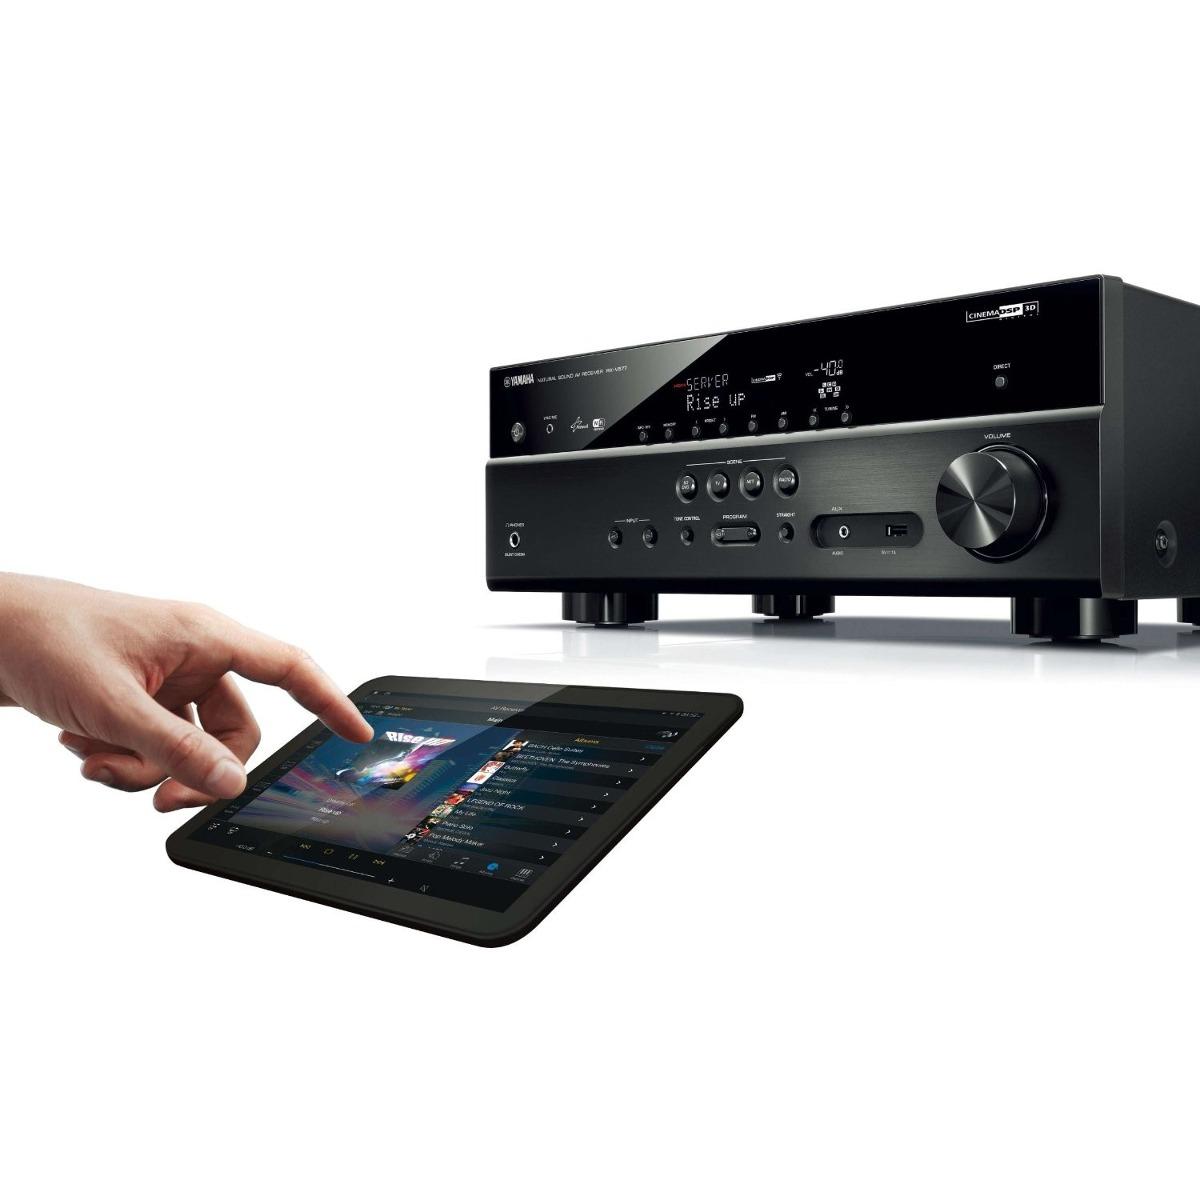 Yamaha rx v577 7 2 channel wi fi network av receiver for Yamaha rx v675 7 2 channel network av receiver with airplay